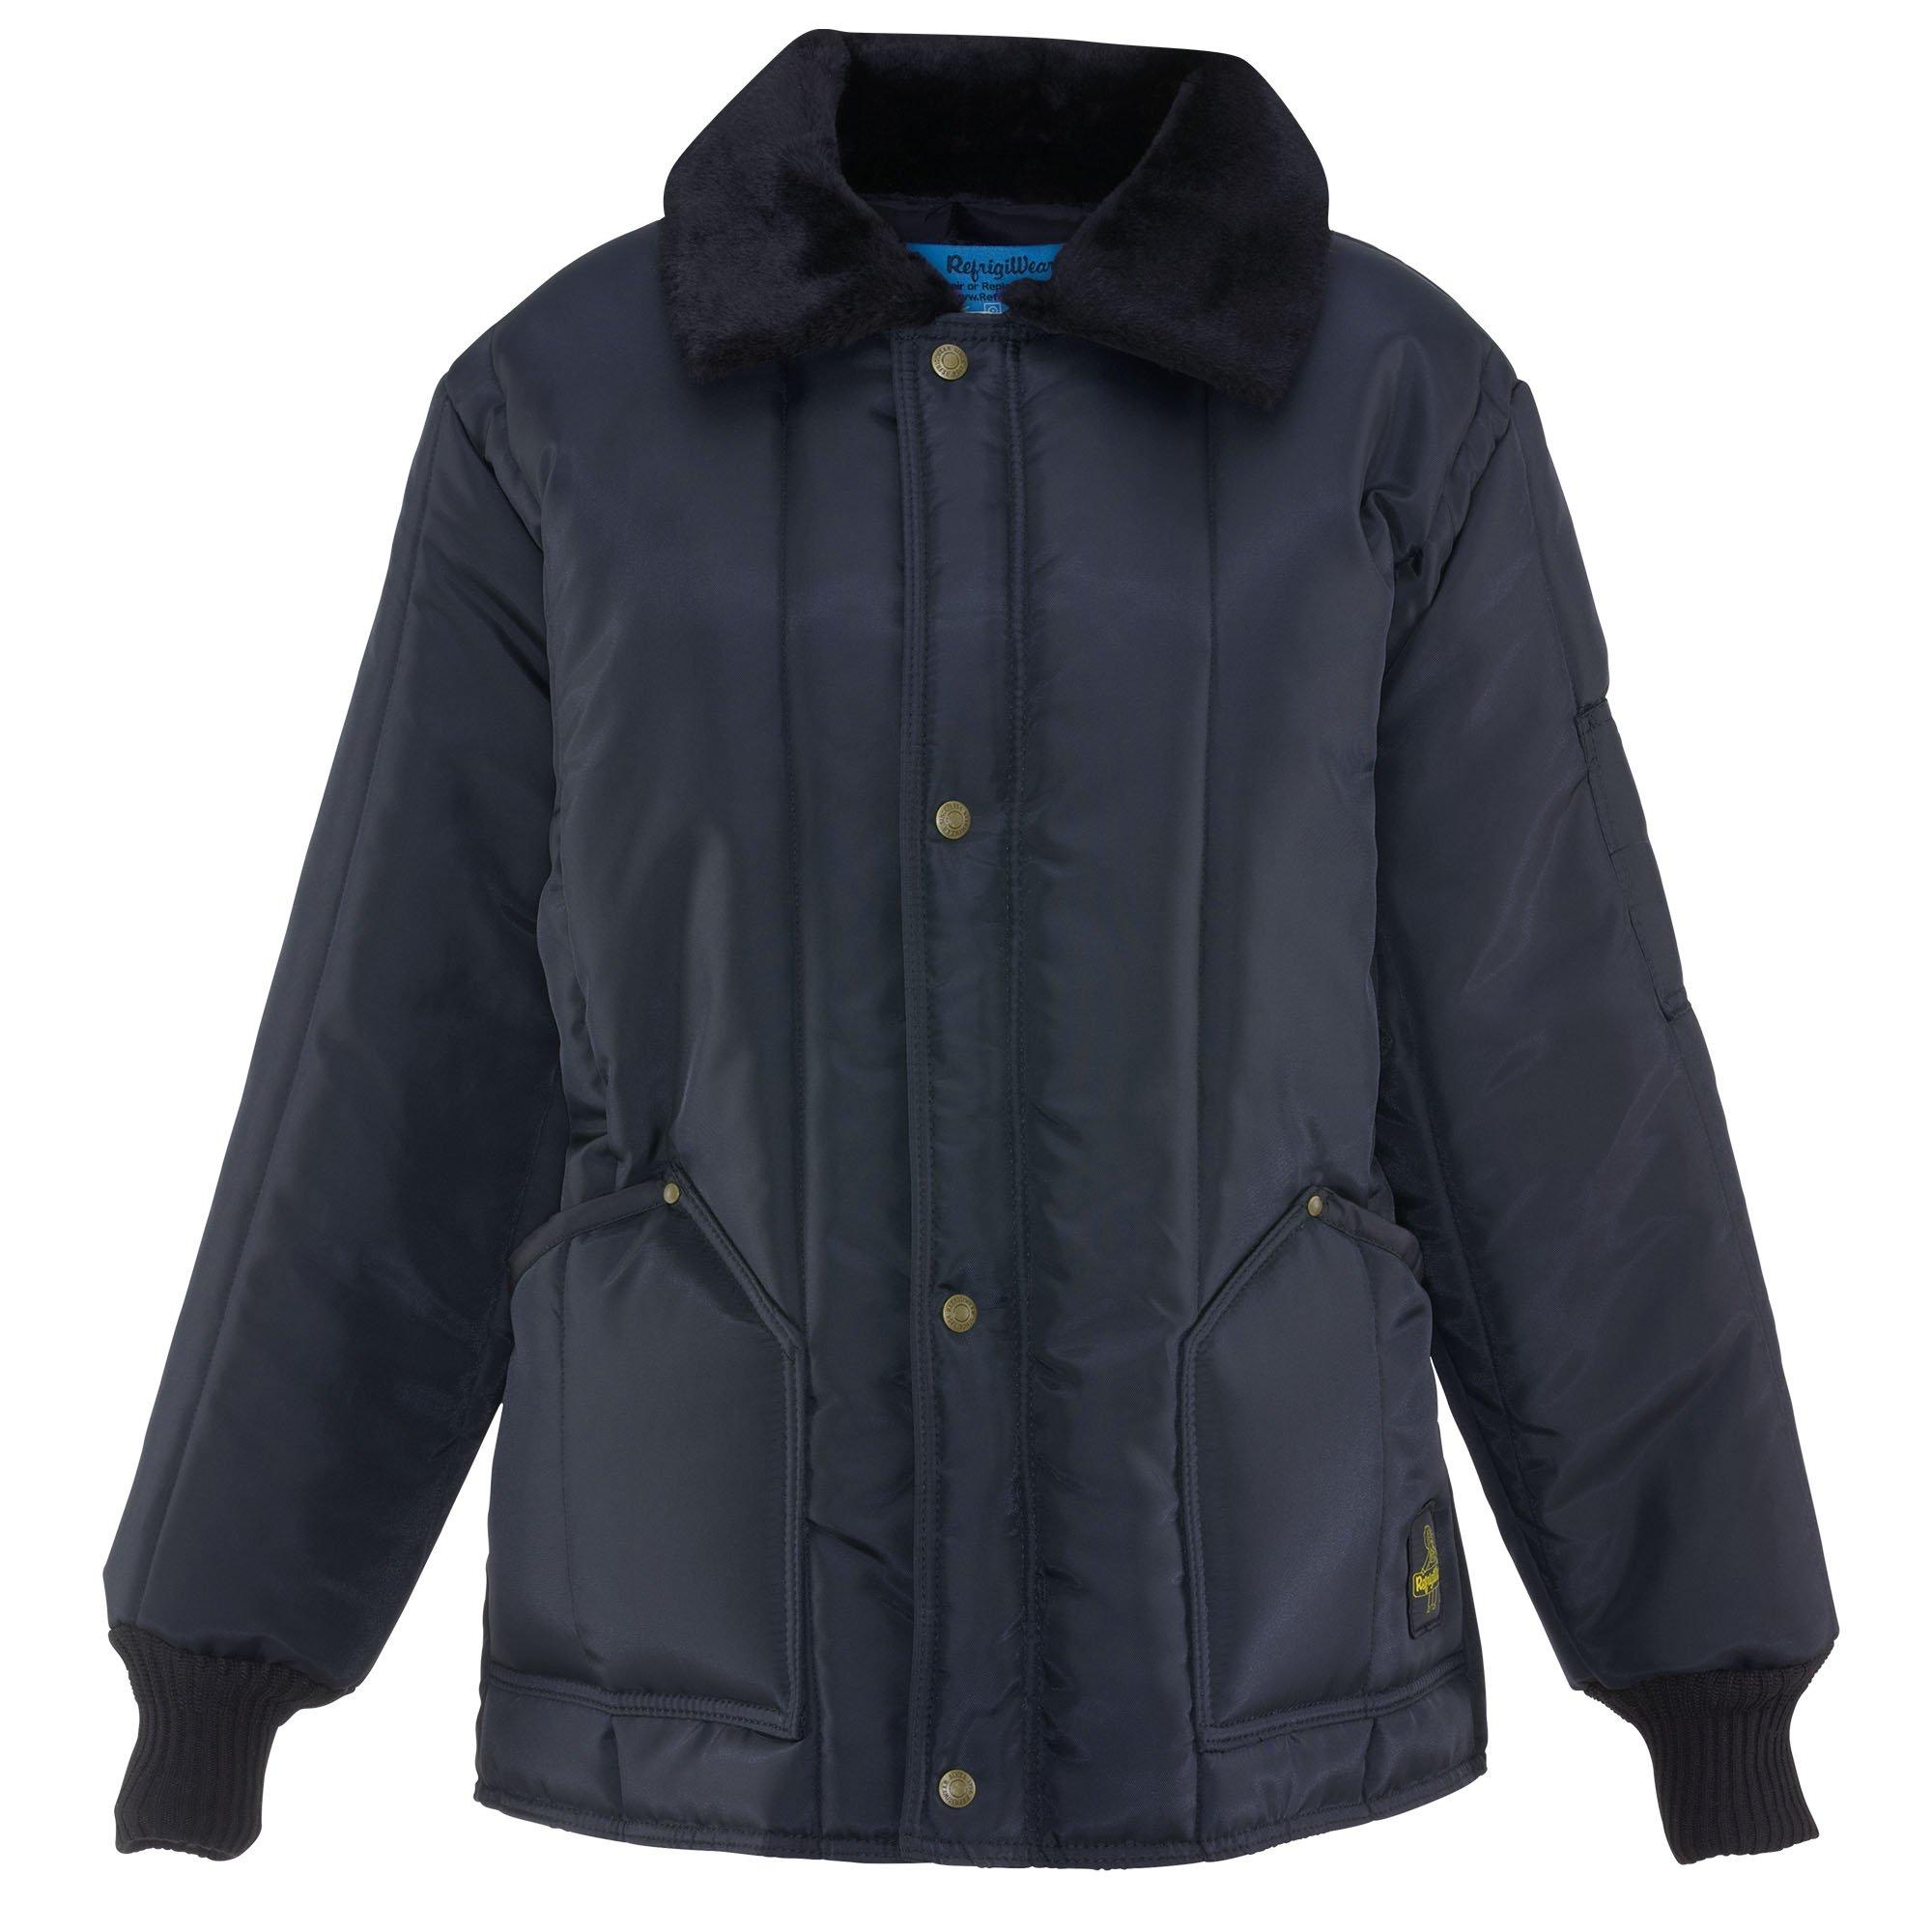 Refrigiwear Women's Water-Resistant Insulated Iron-Tuff Polar Jacket (Navy Blue, Small)